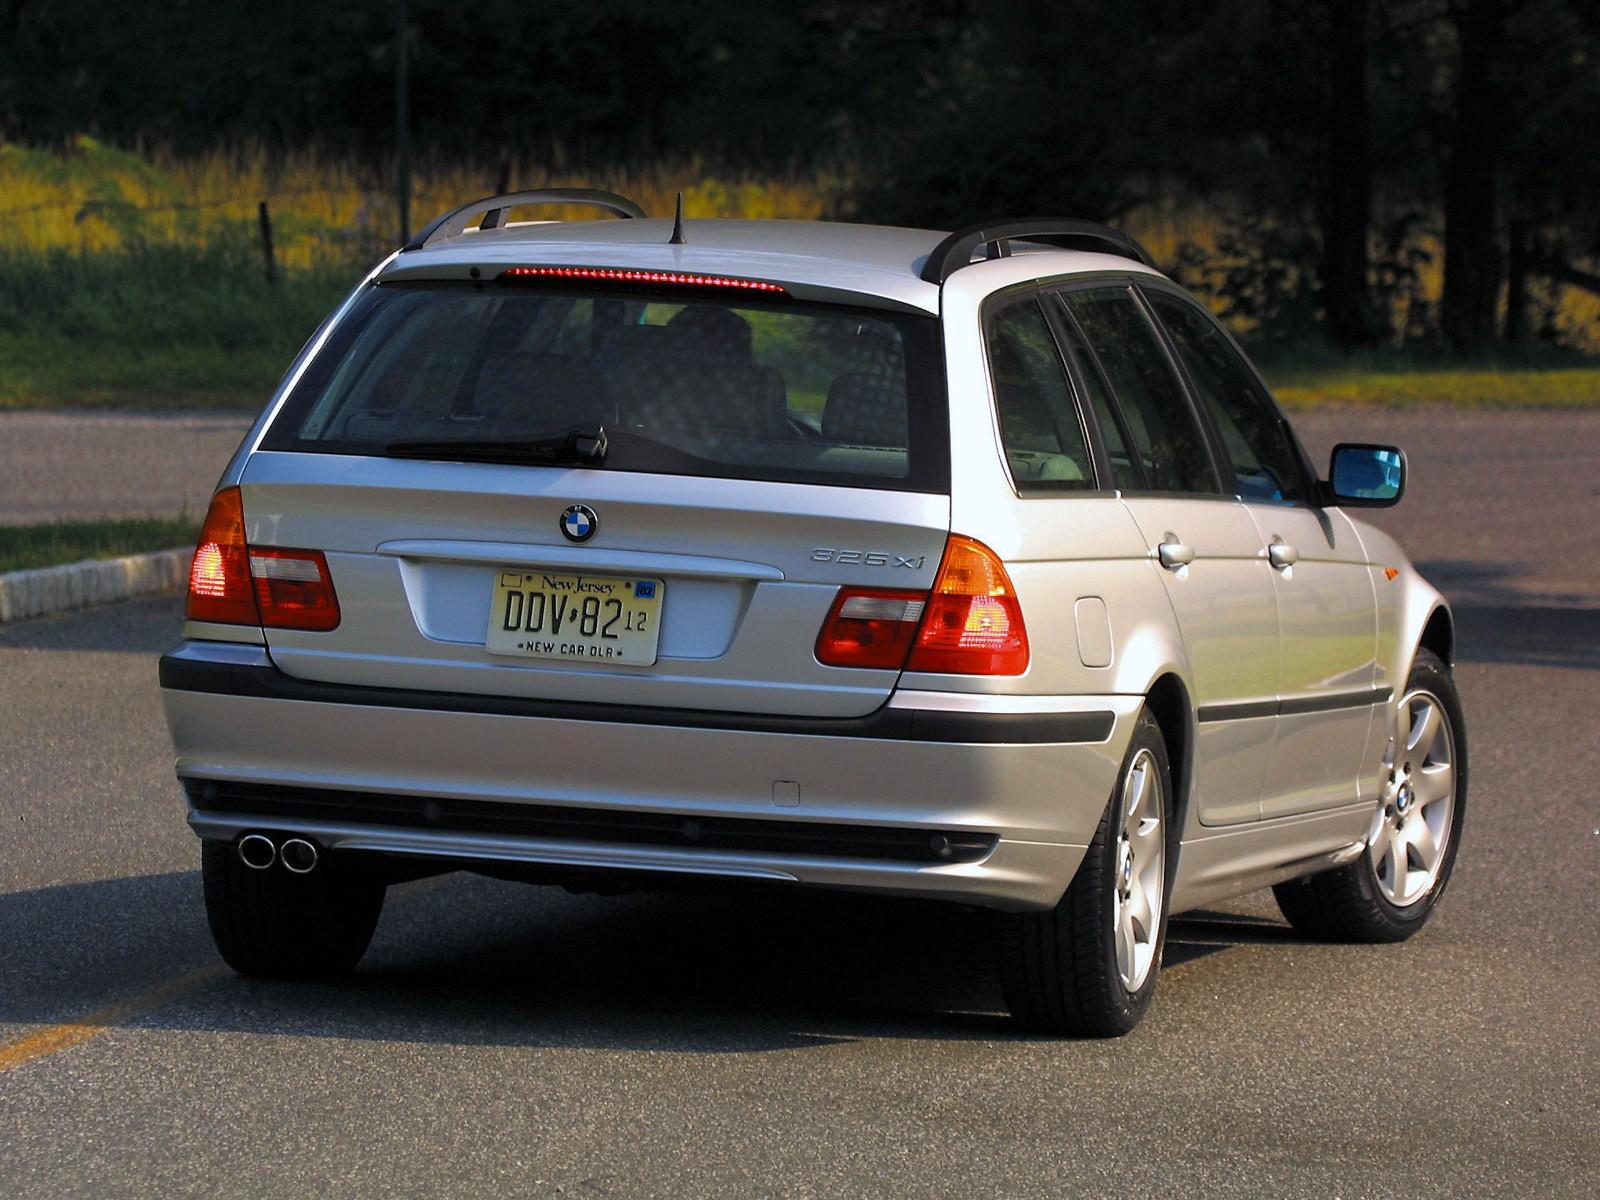 BMW 3 Series Touring (E46) - 1999, 2000, 2001 - autoevolution